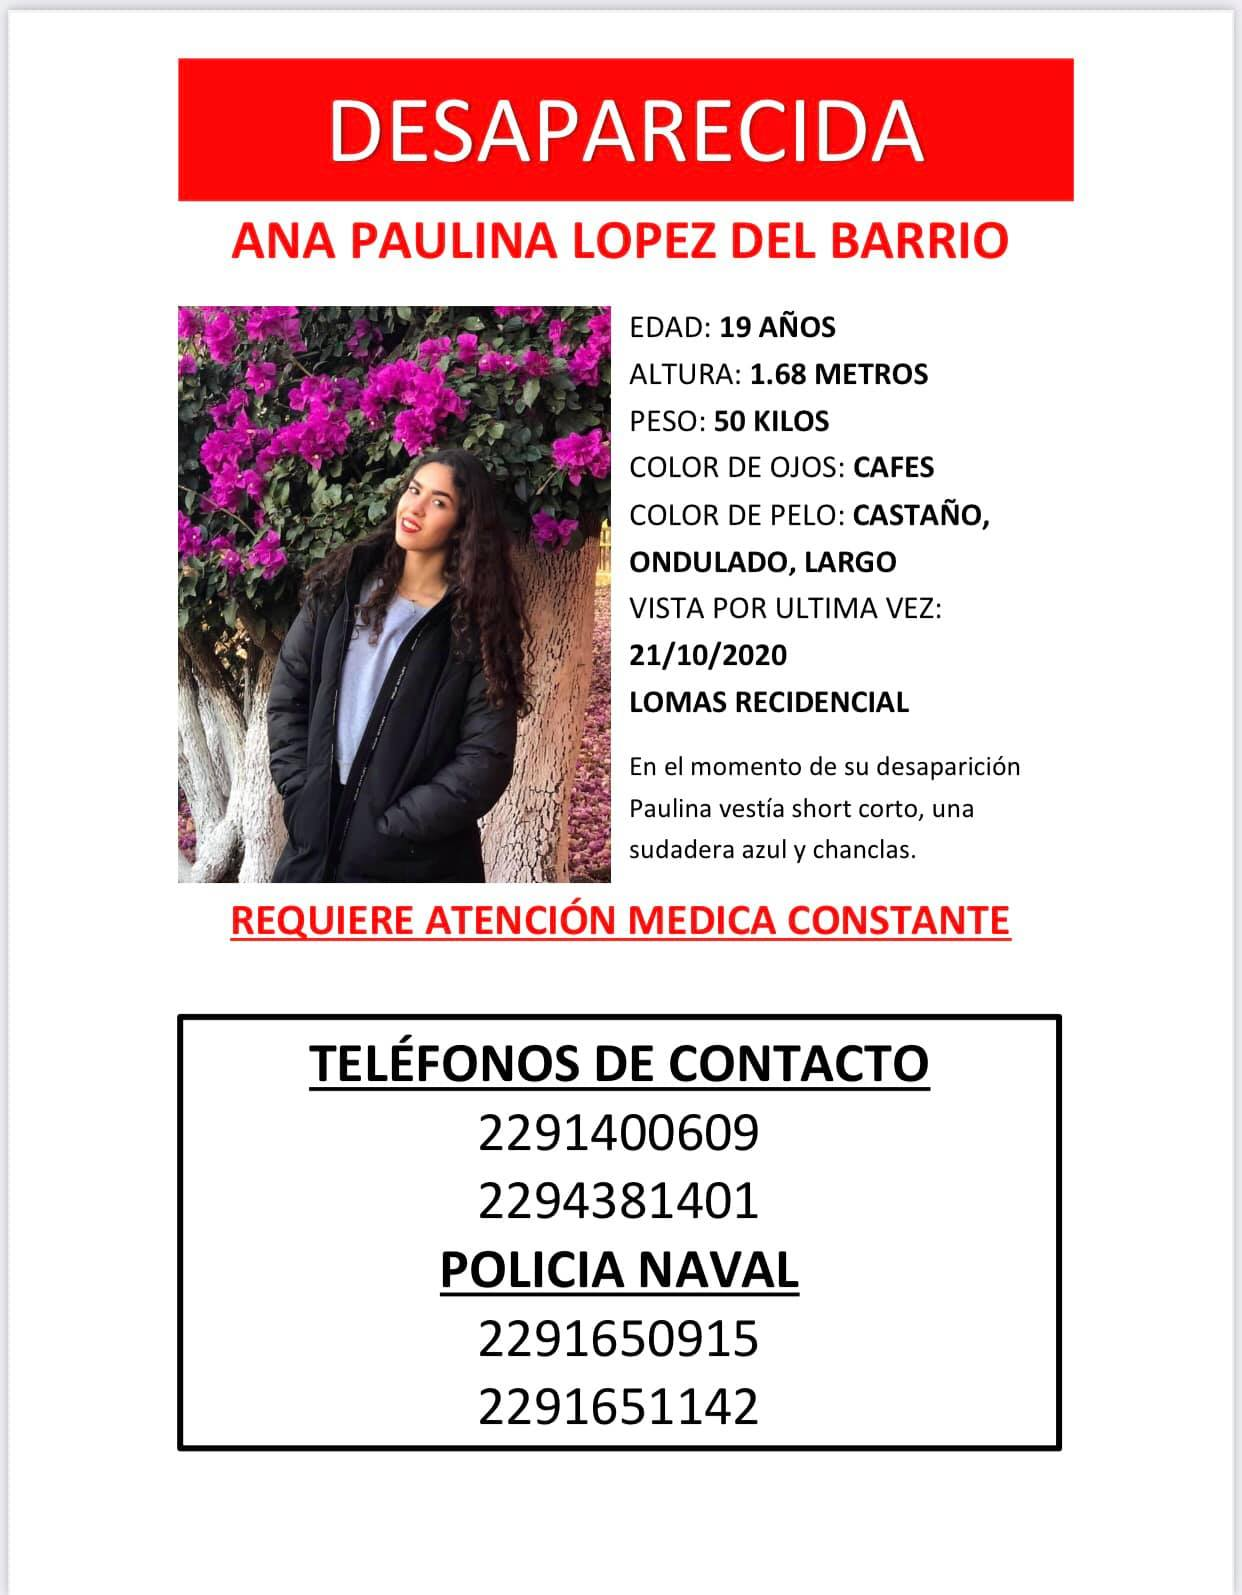 Ana Paulina, la joven reportada como desaparecida asegura estar bien.